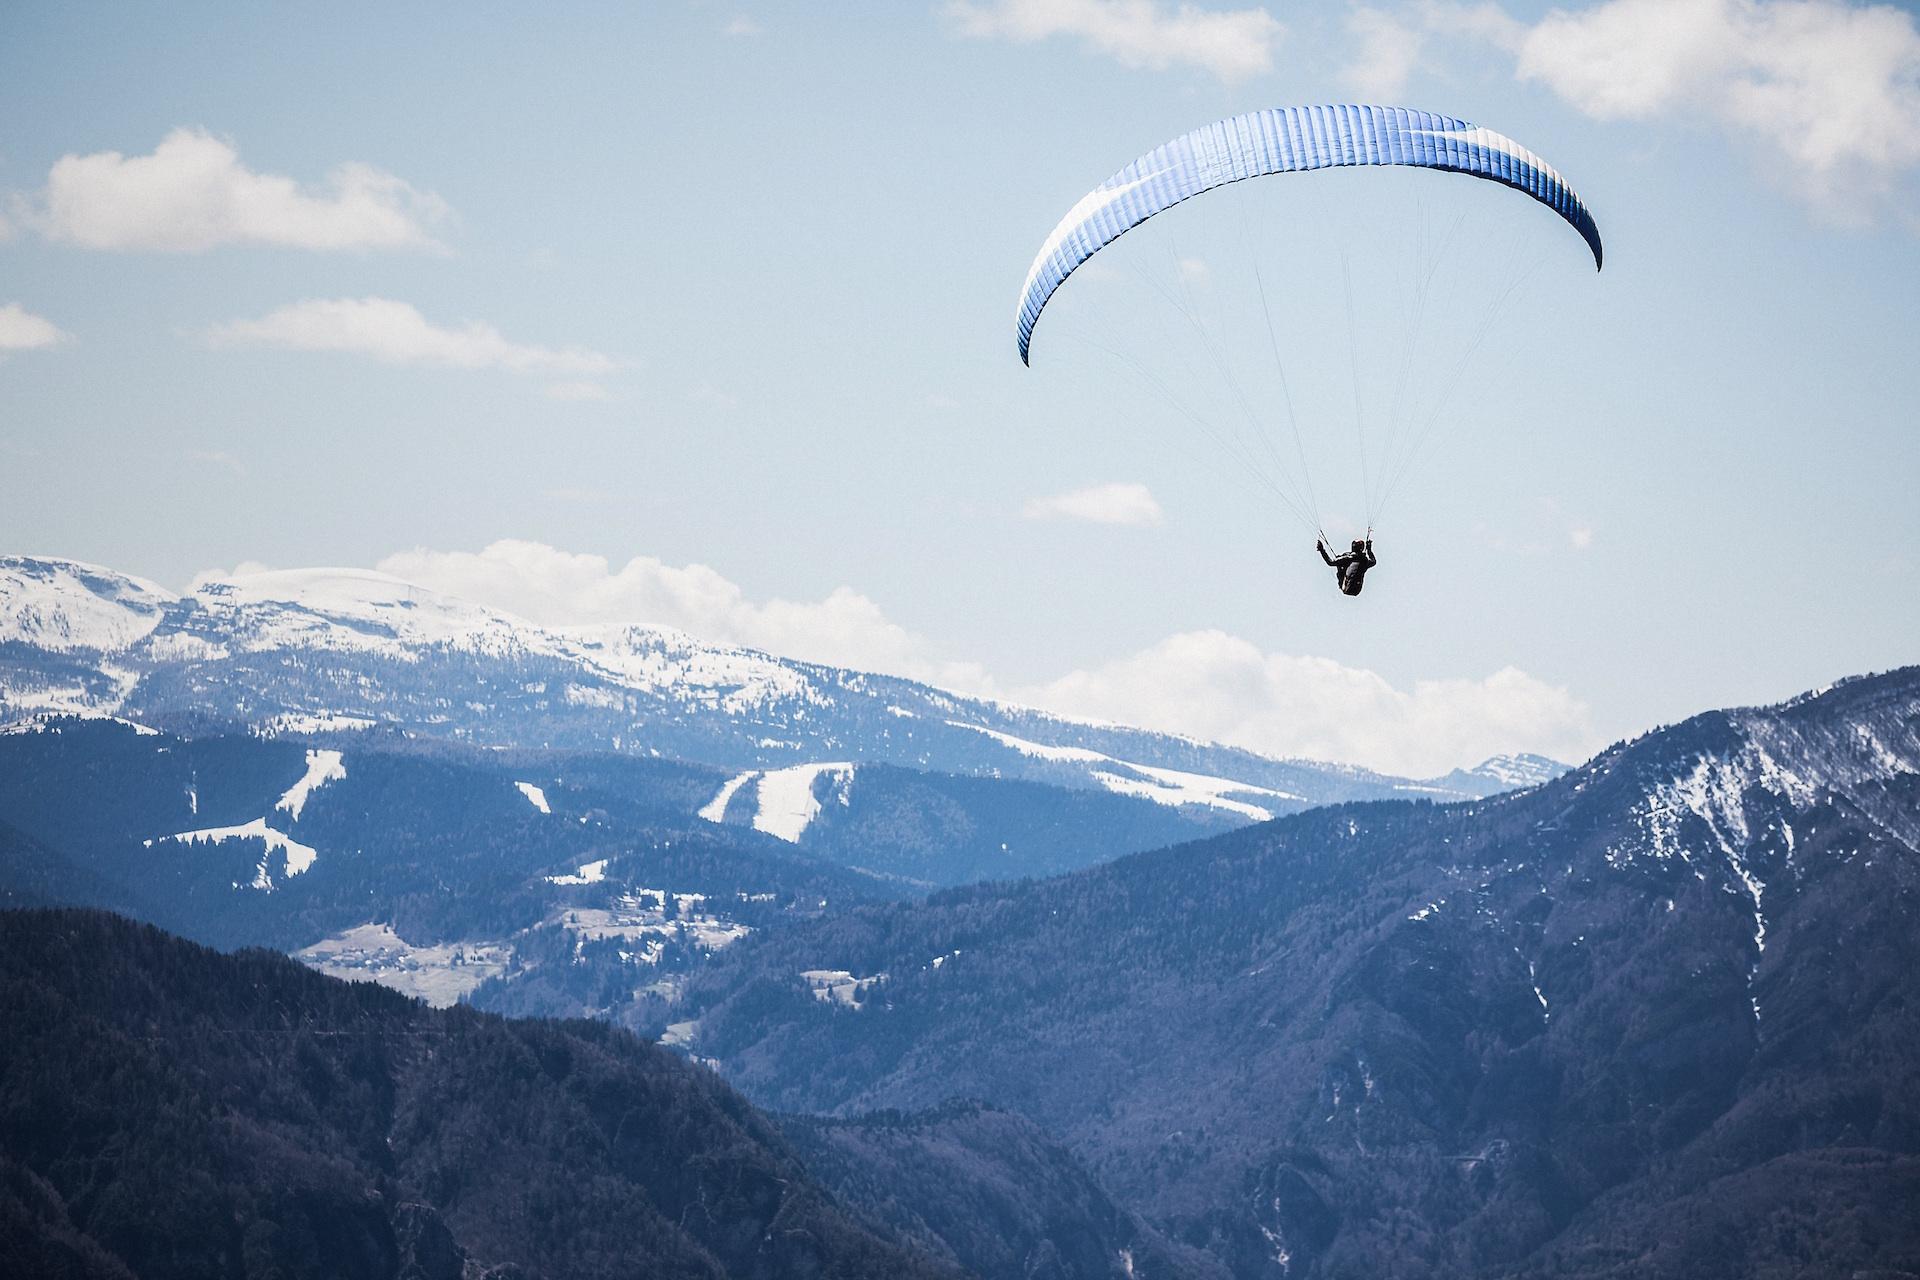 parapente, motor, montañas, volar, cielo - Fondos de Pantalla HD - professor-falken.com